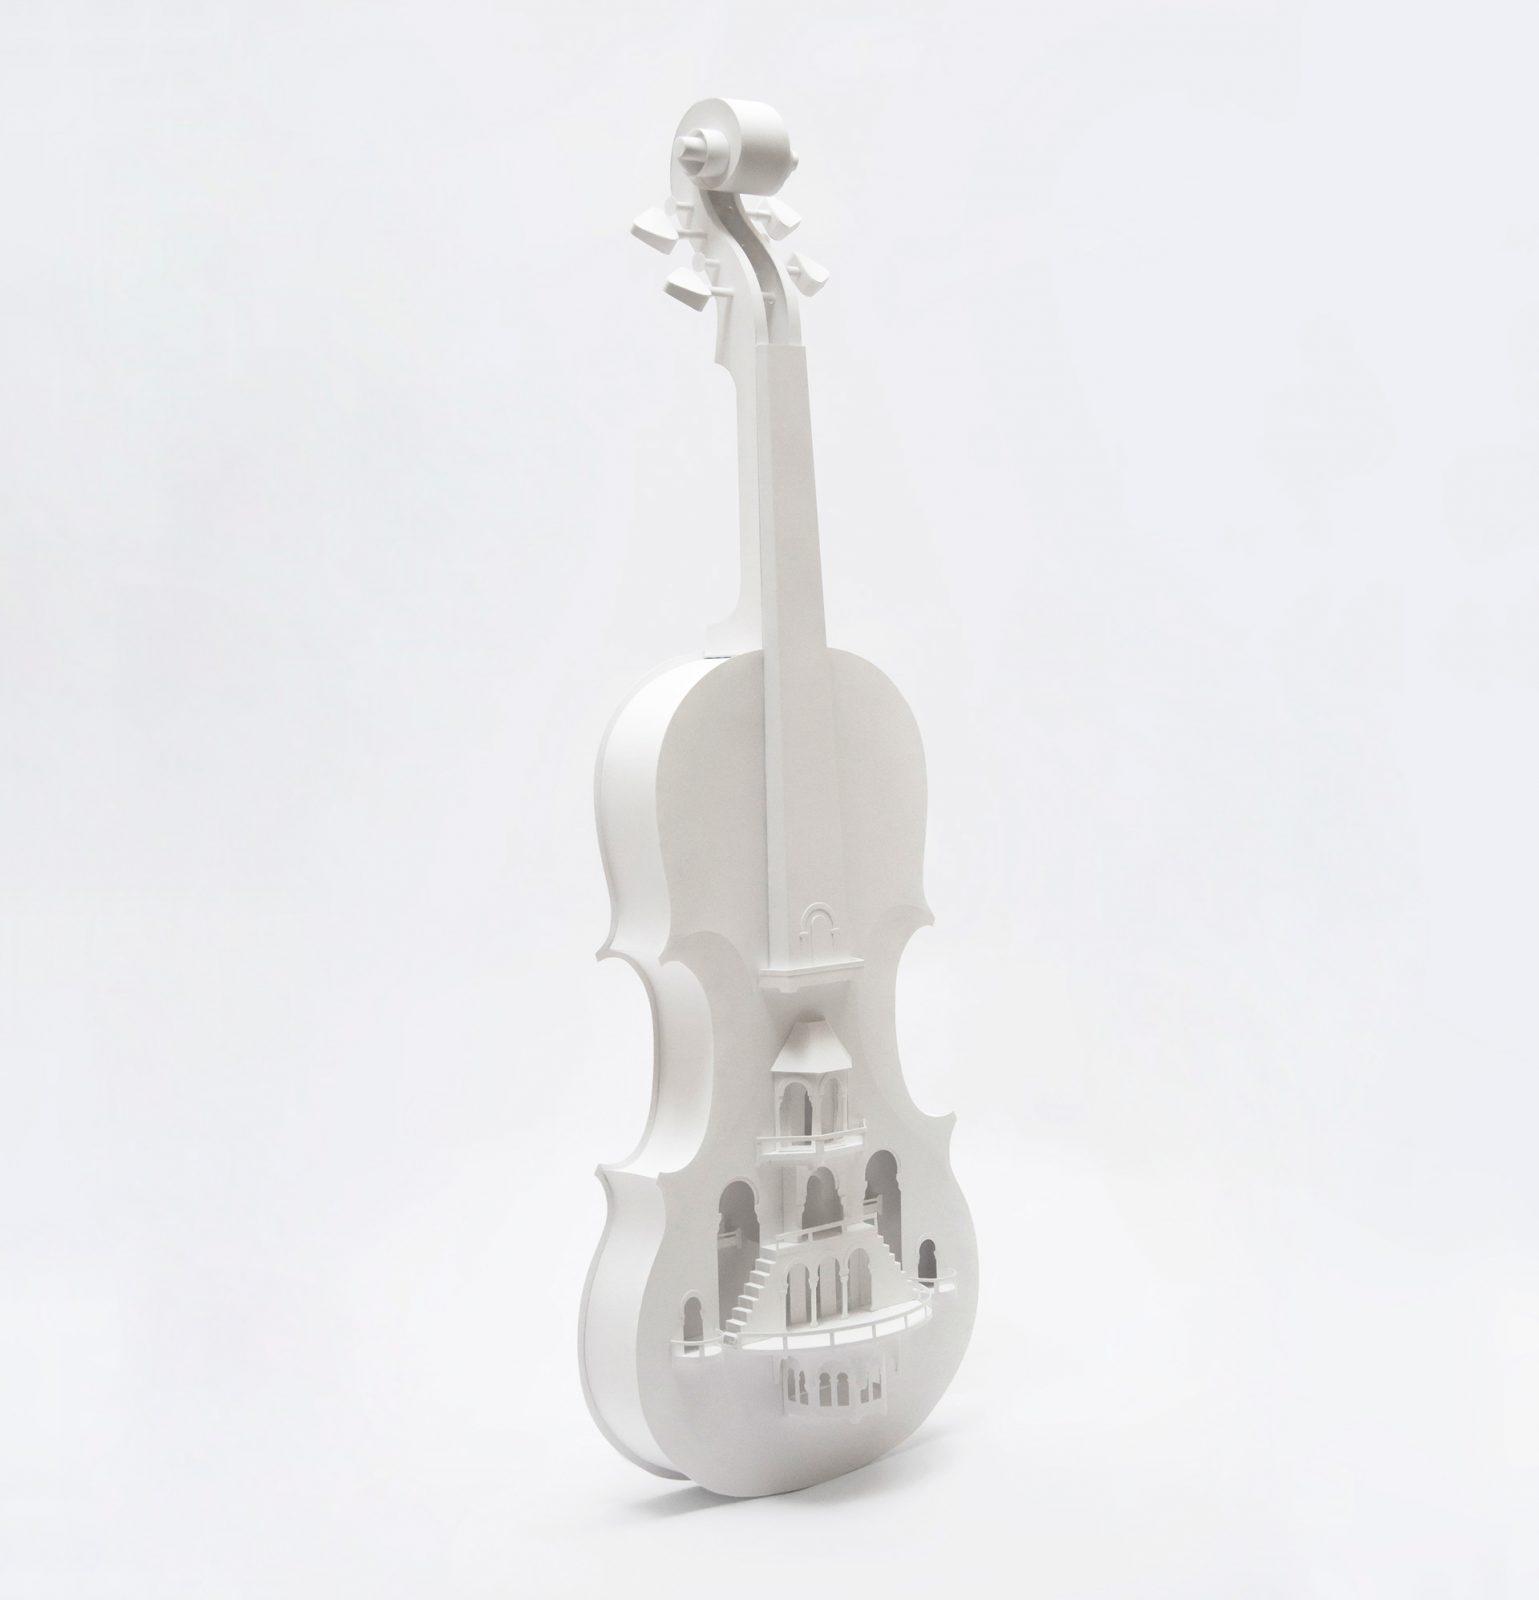 Violin City Paper Sculpture by Pratìc Studio